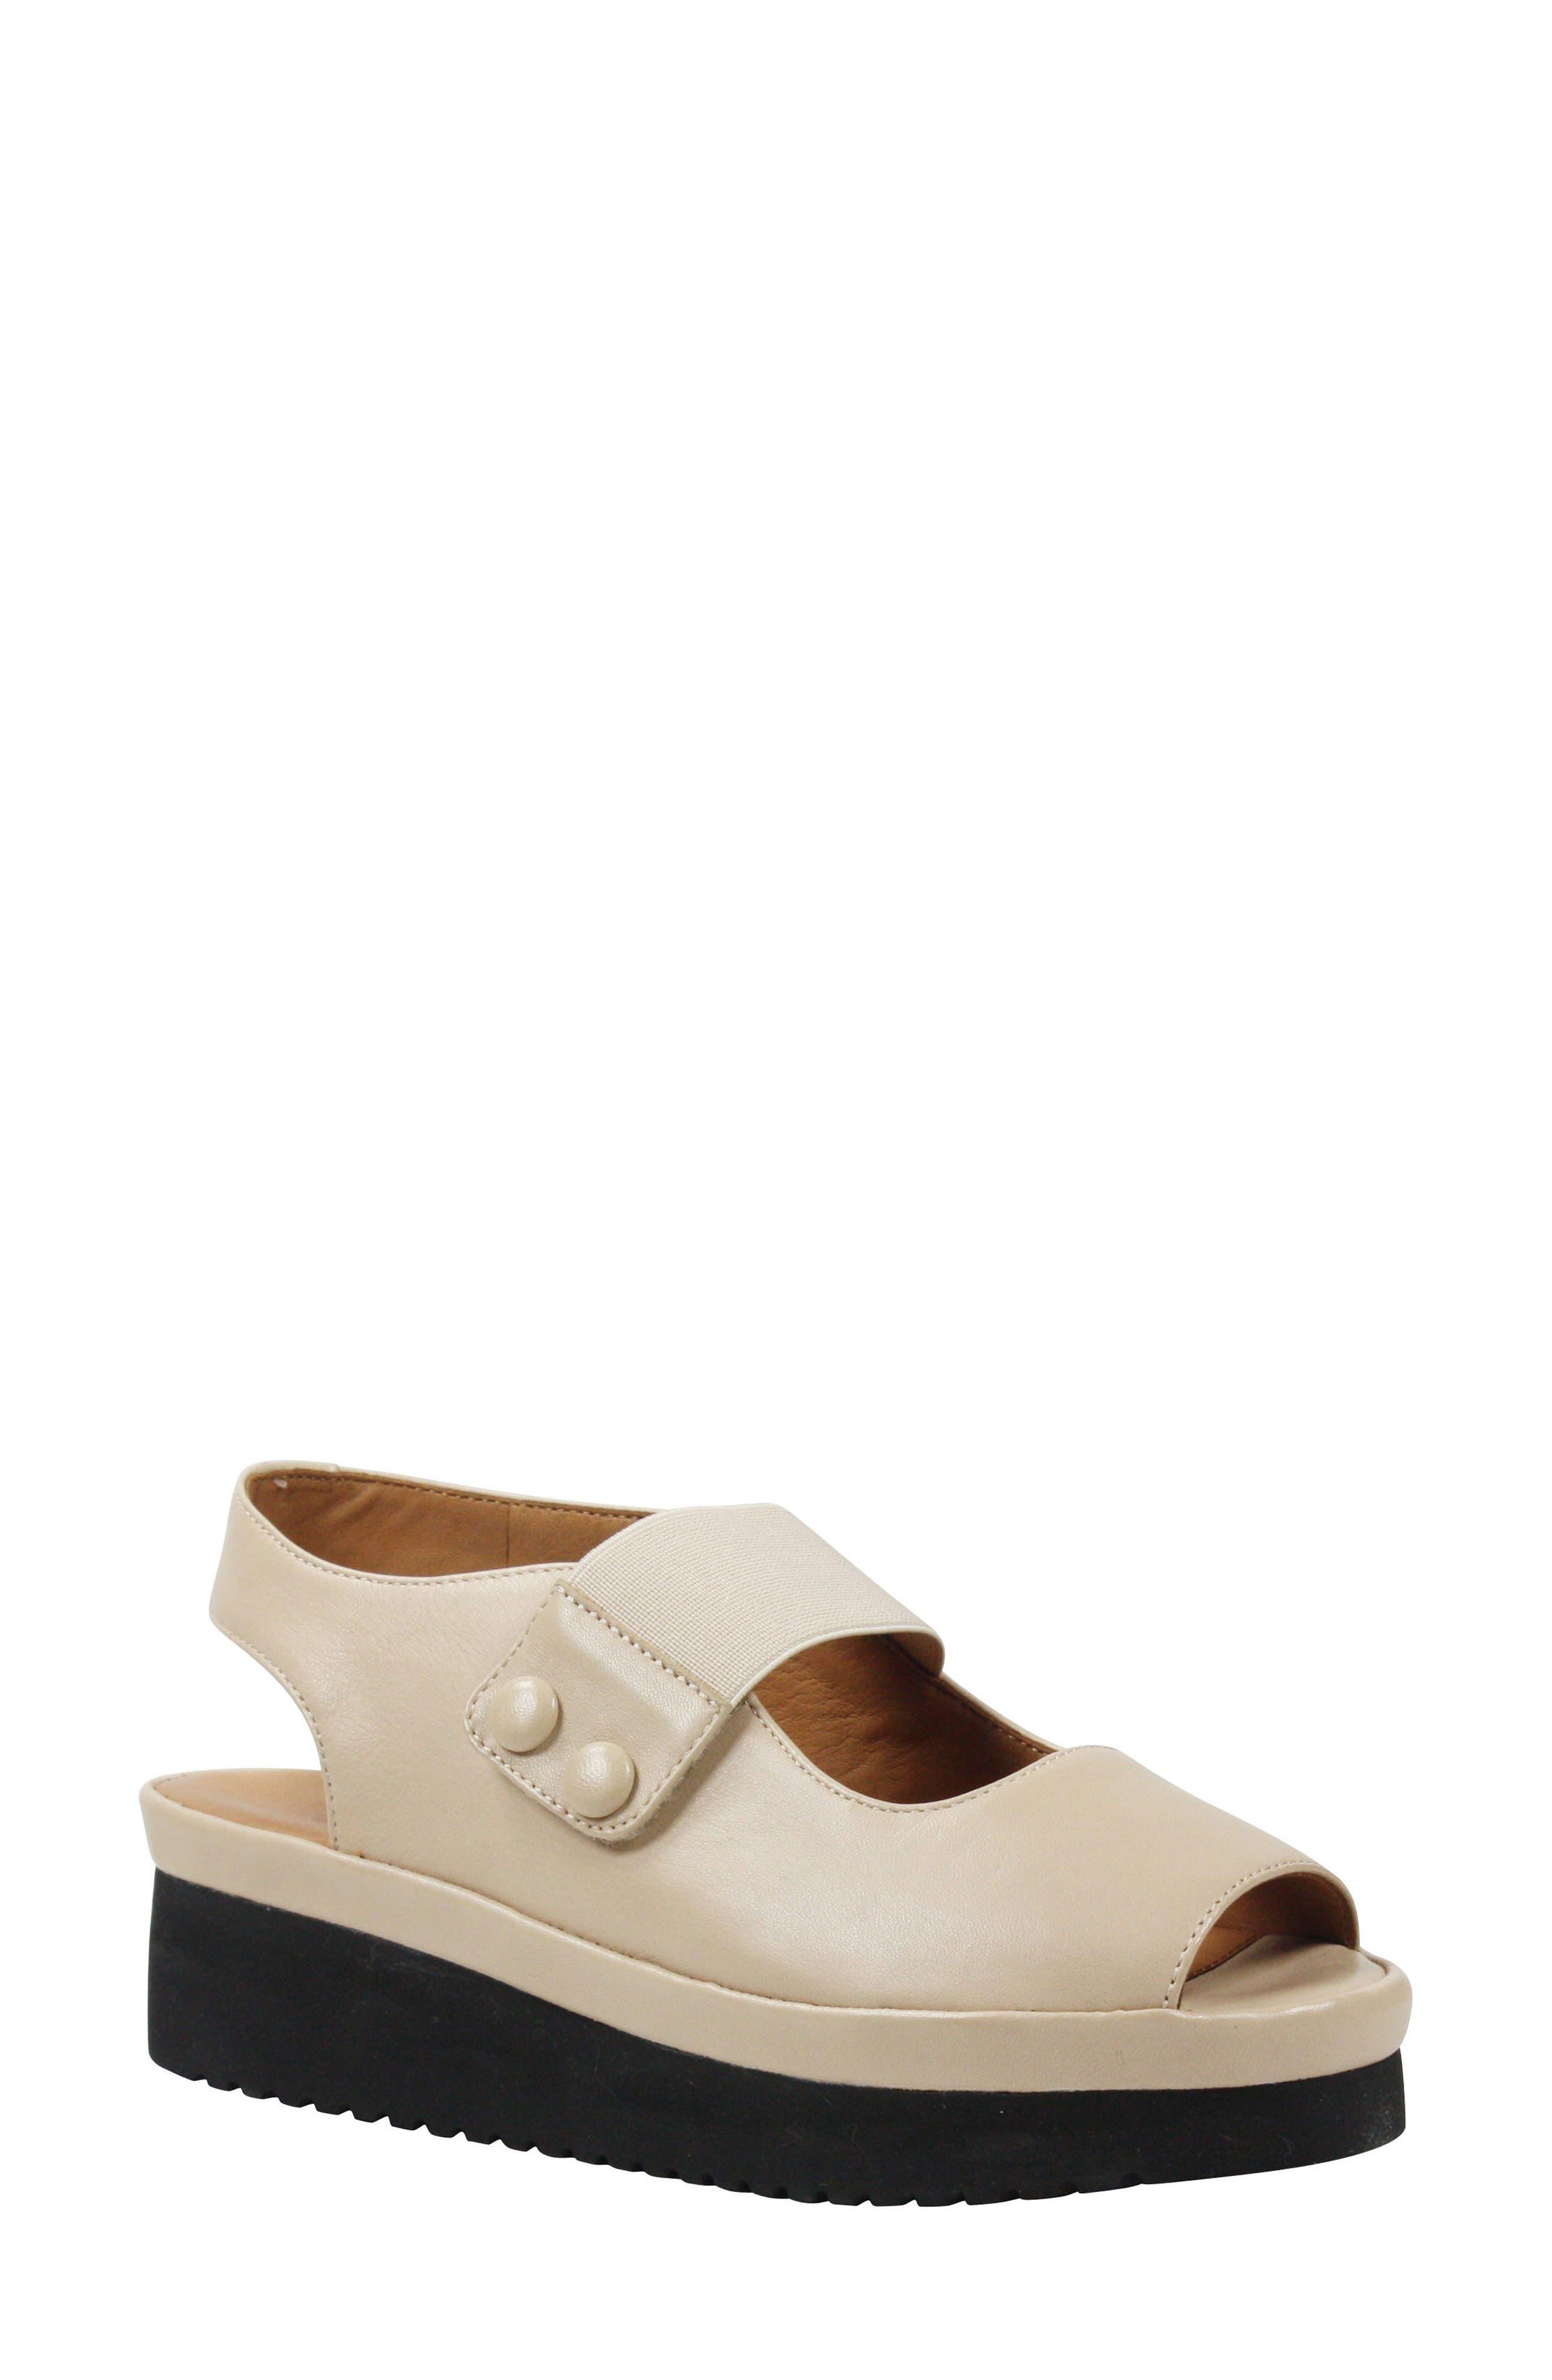 L'AMOUR DES PIEDS Adalicia Platform Sandal, Main, color, NUDE LEATHER